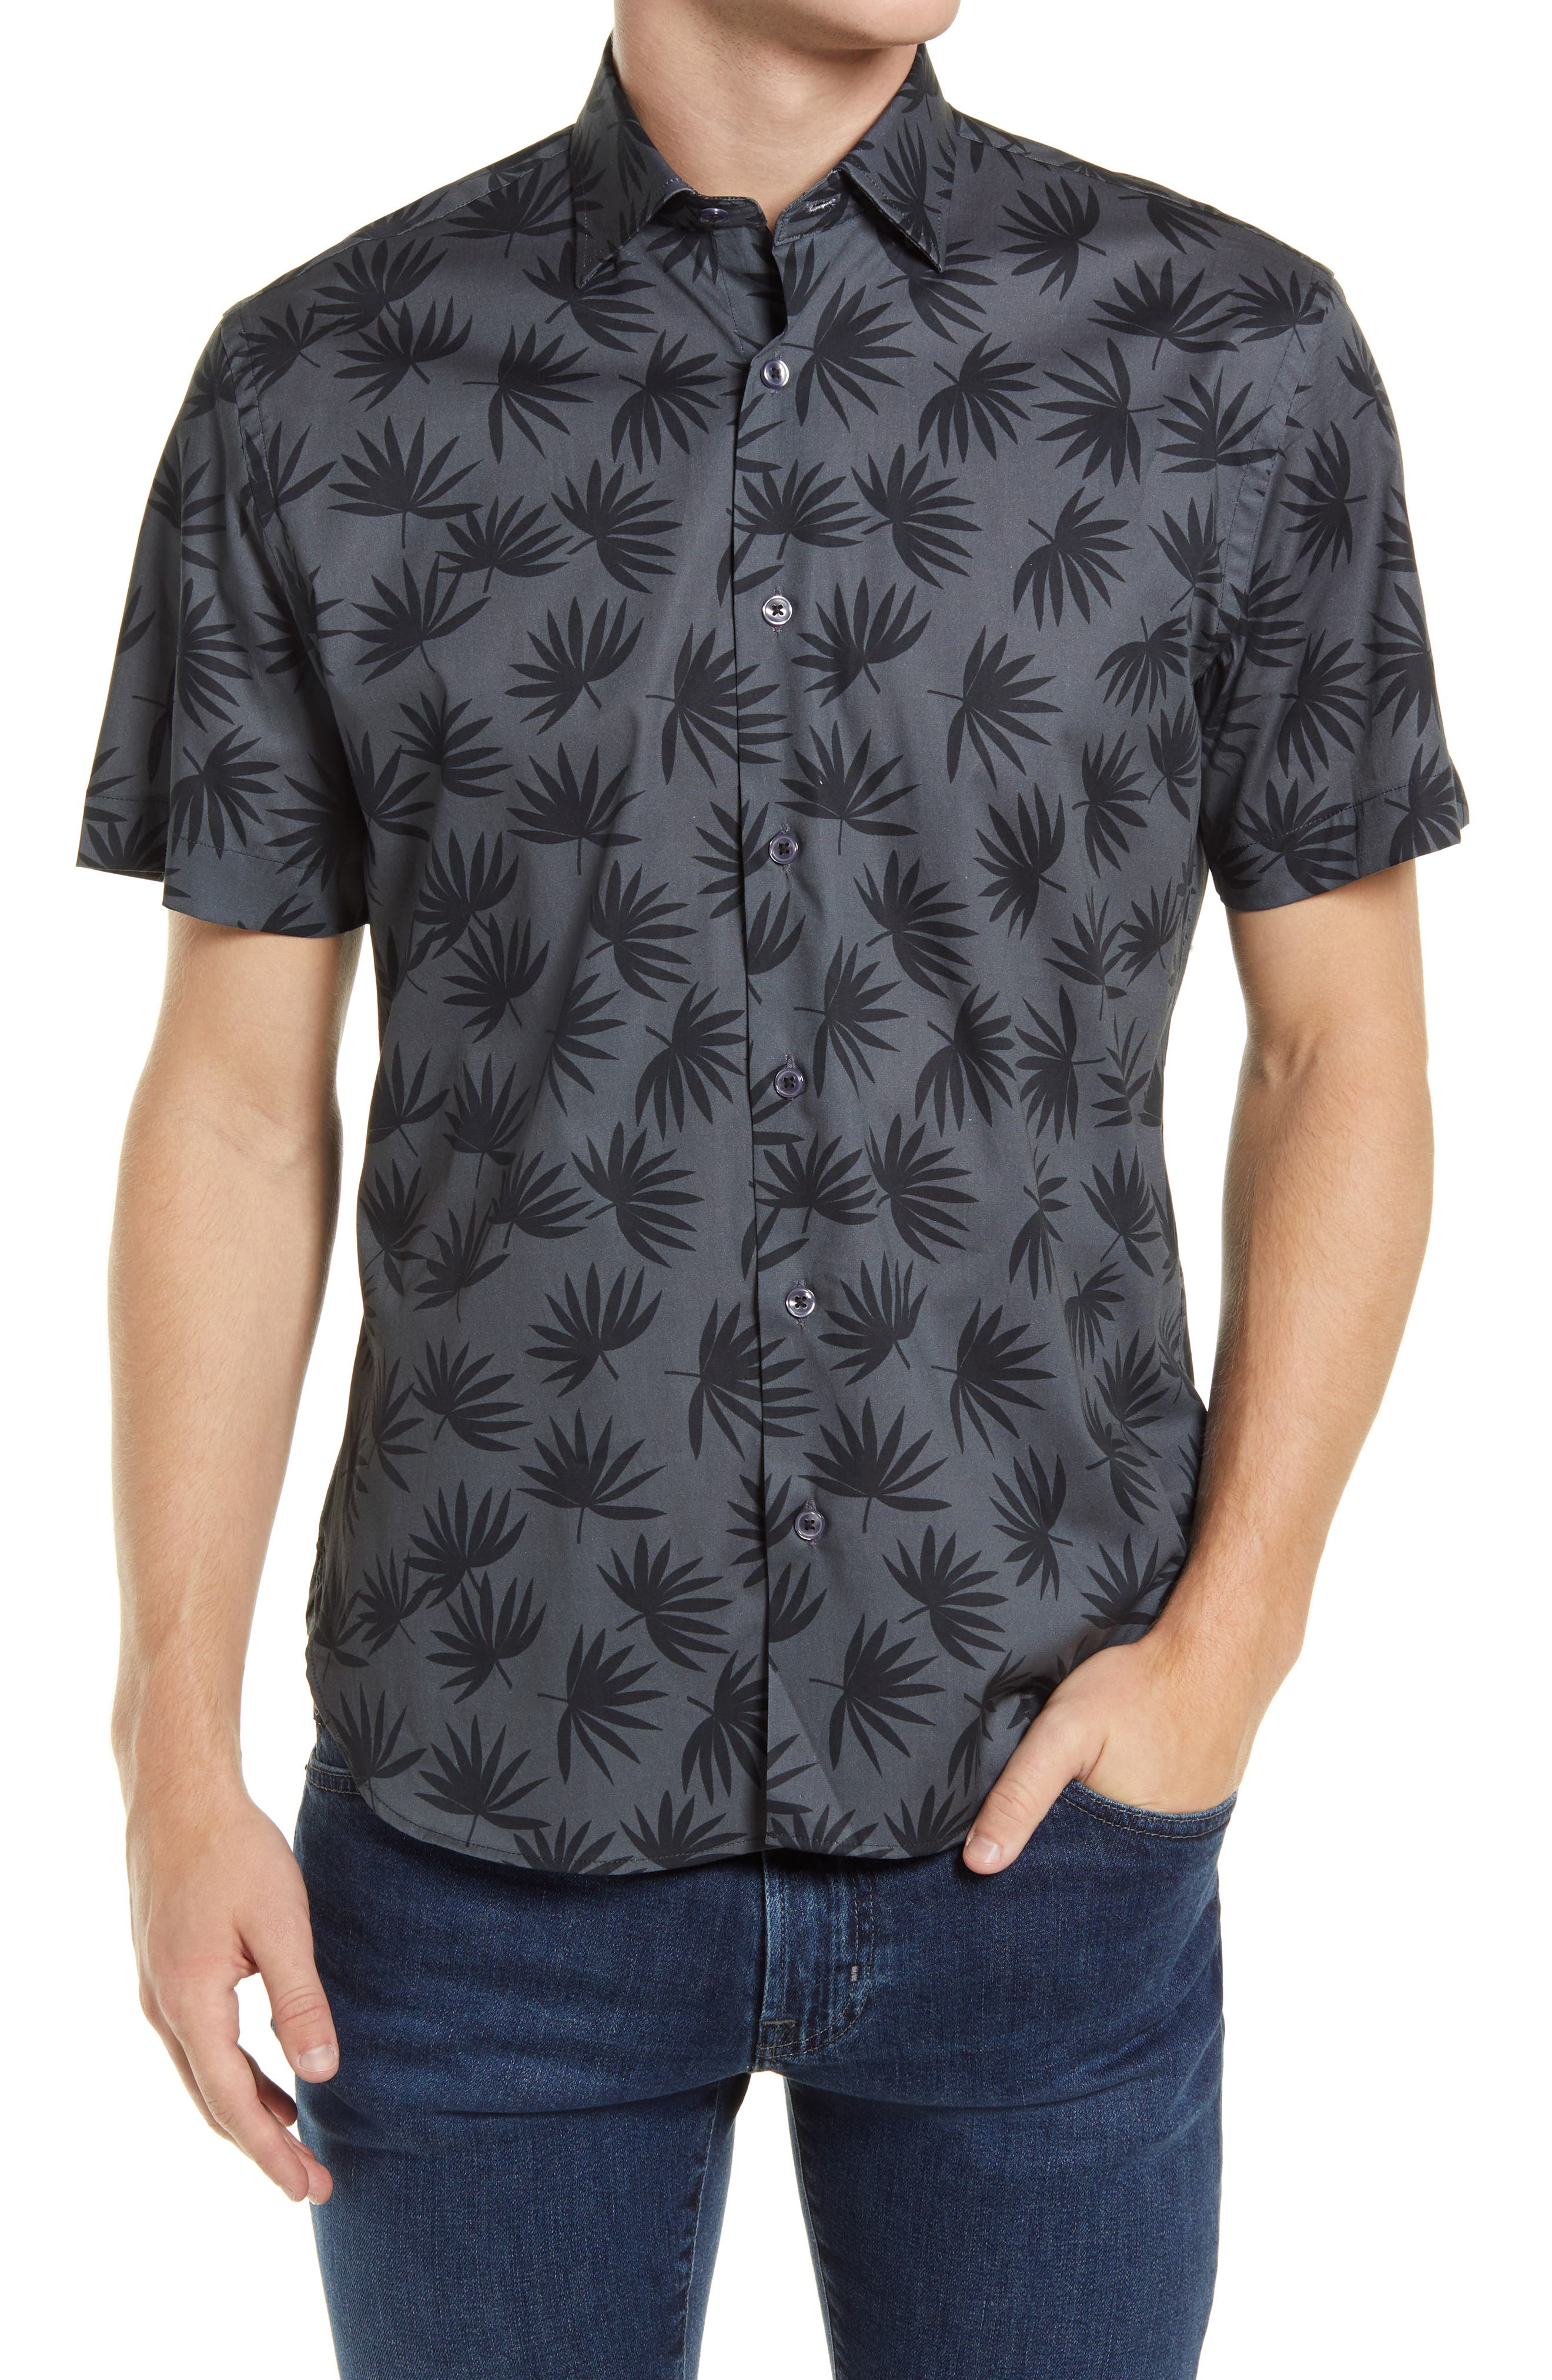 Fan Me Leaf Print Short Sleeve Stretch Button-Up Shirt